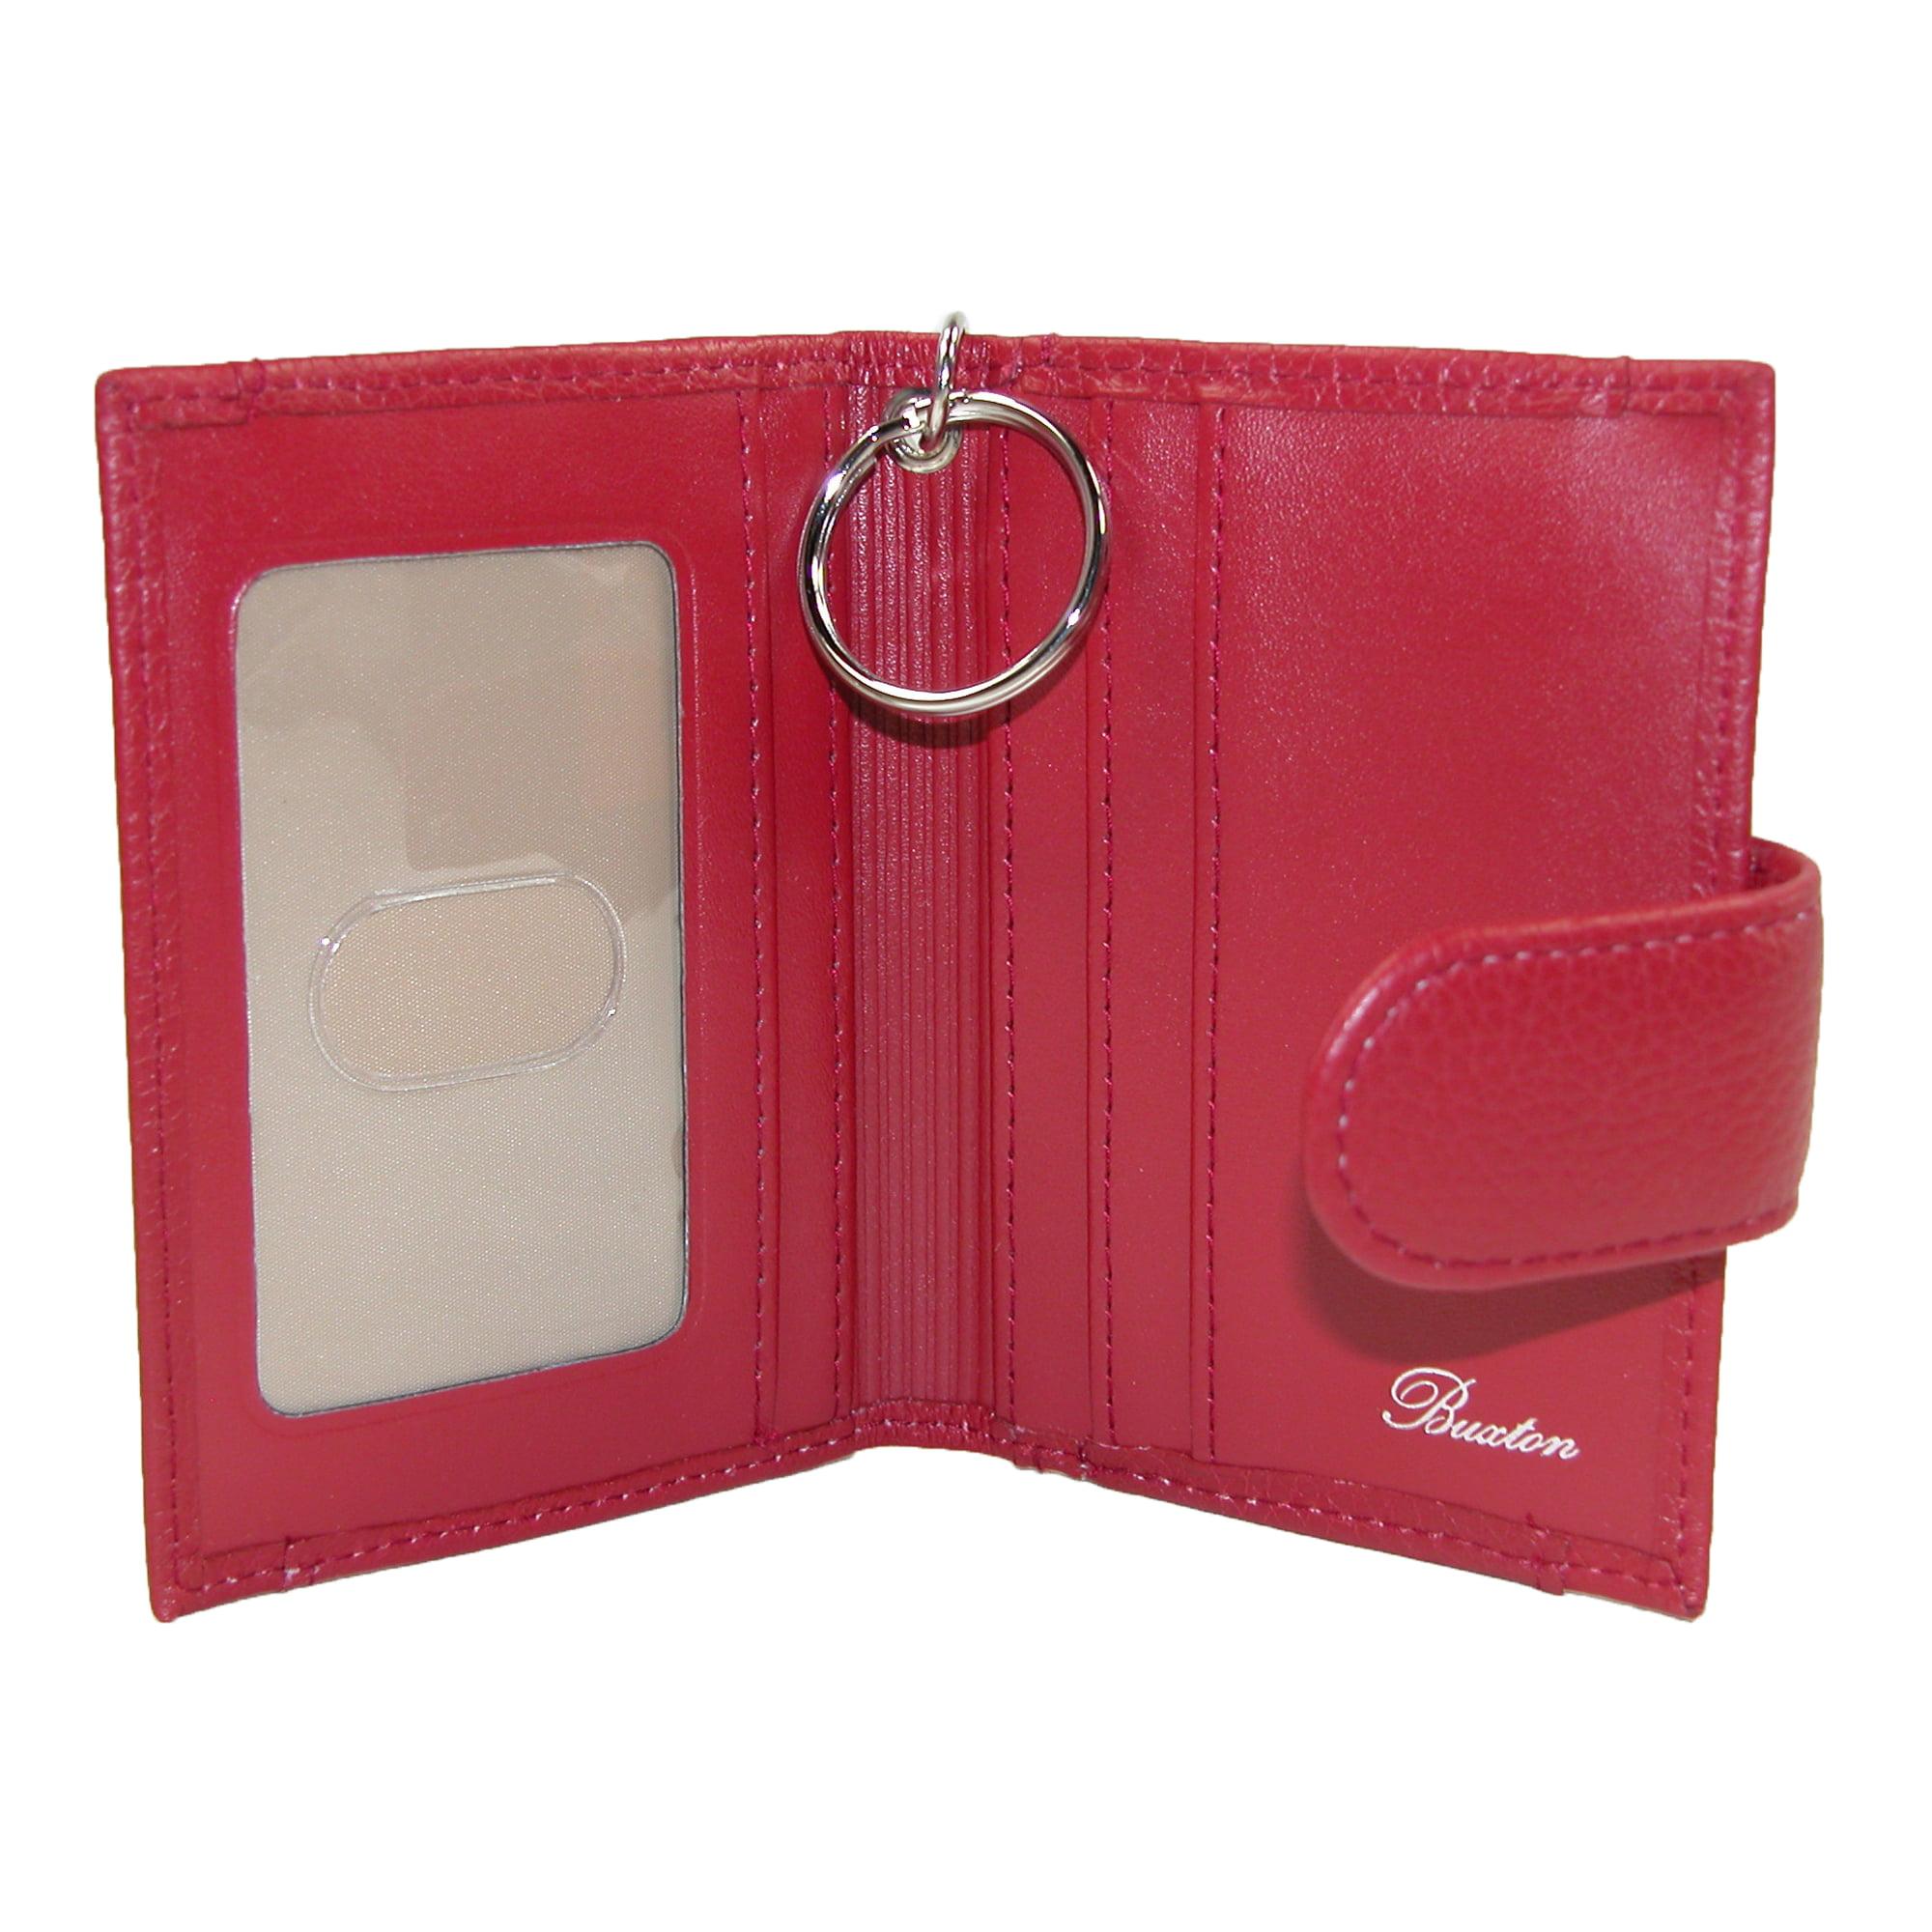 Buxton Women\'s Leather Key Chain ID Card Case Wallet - Walmart.com